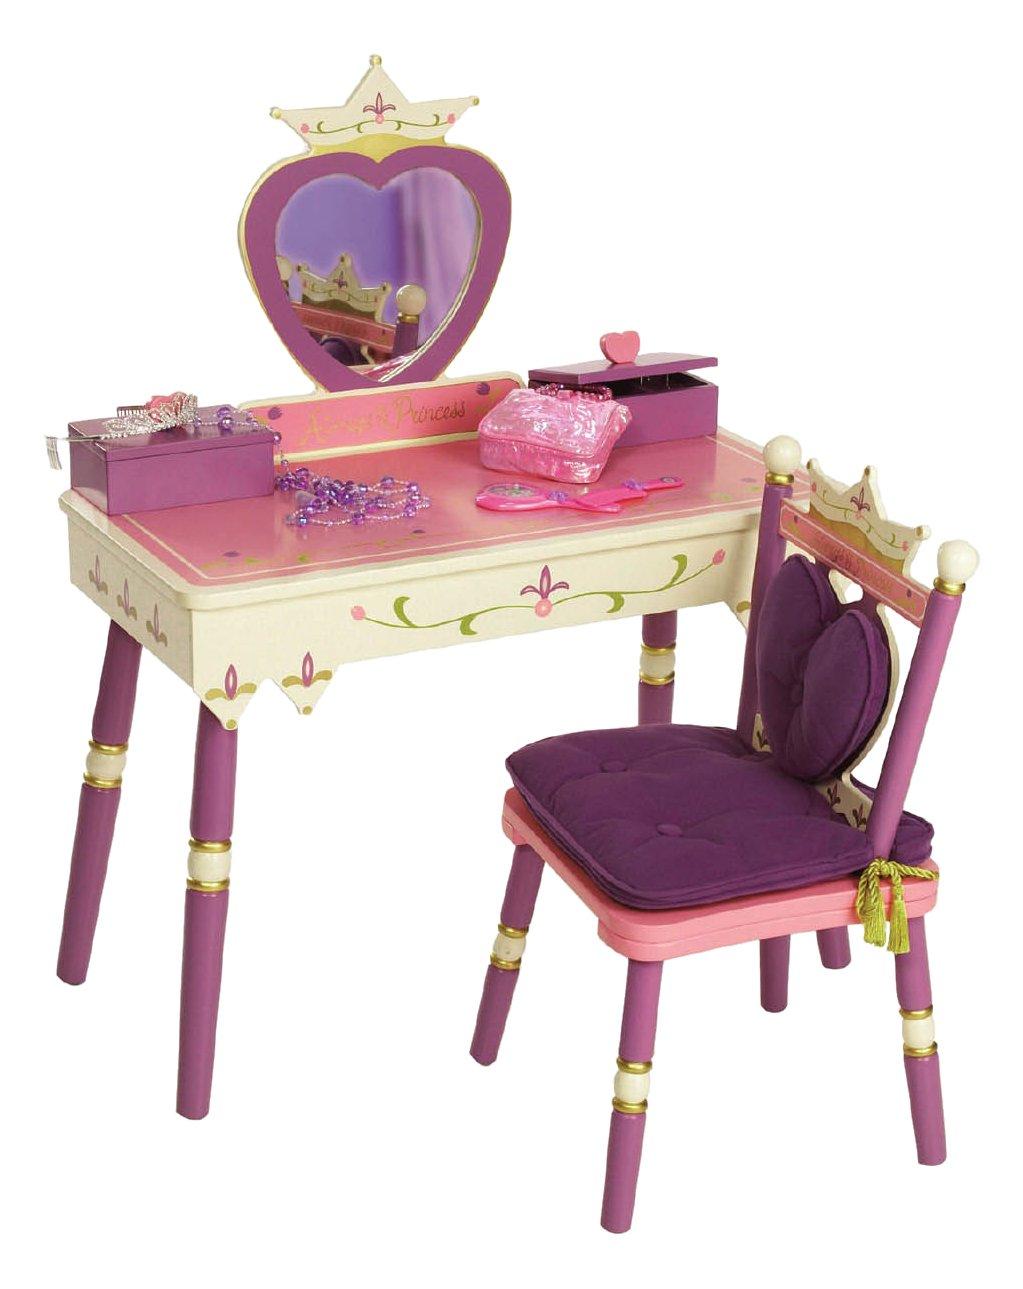 Amazon.com: Wildkin Princess Vanity Table & Chair Set: Toys & Games